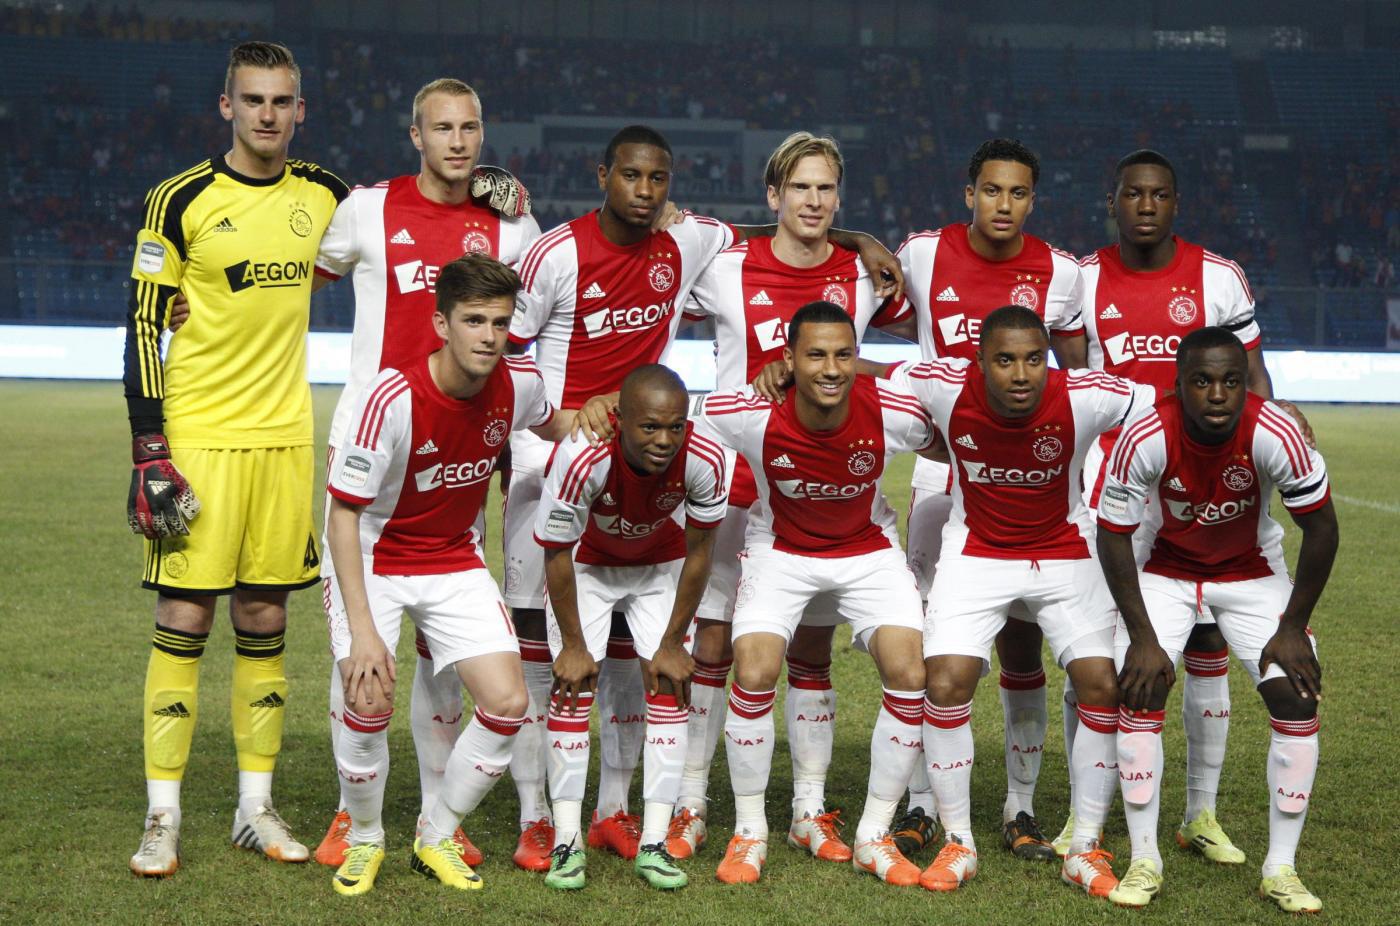 Twente-Ajax mercoledì 20 dicembre